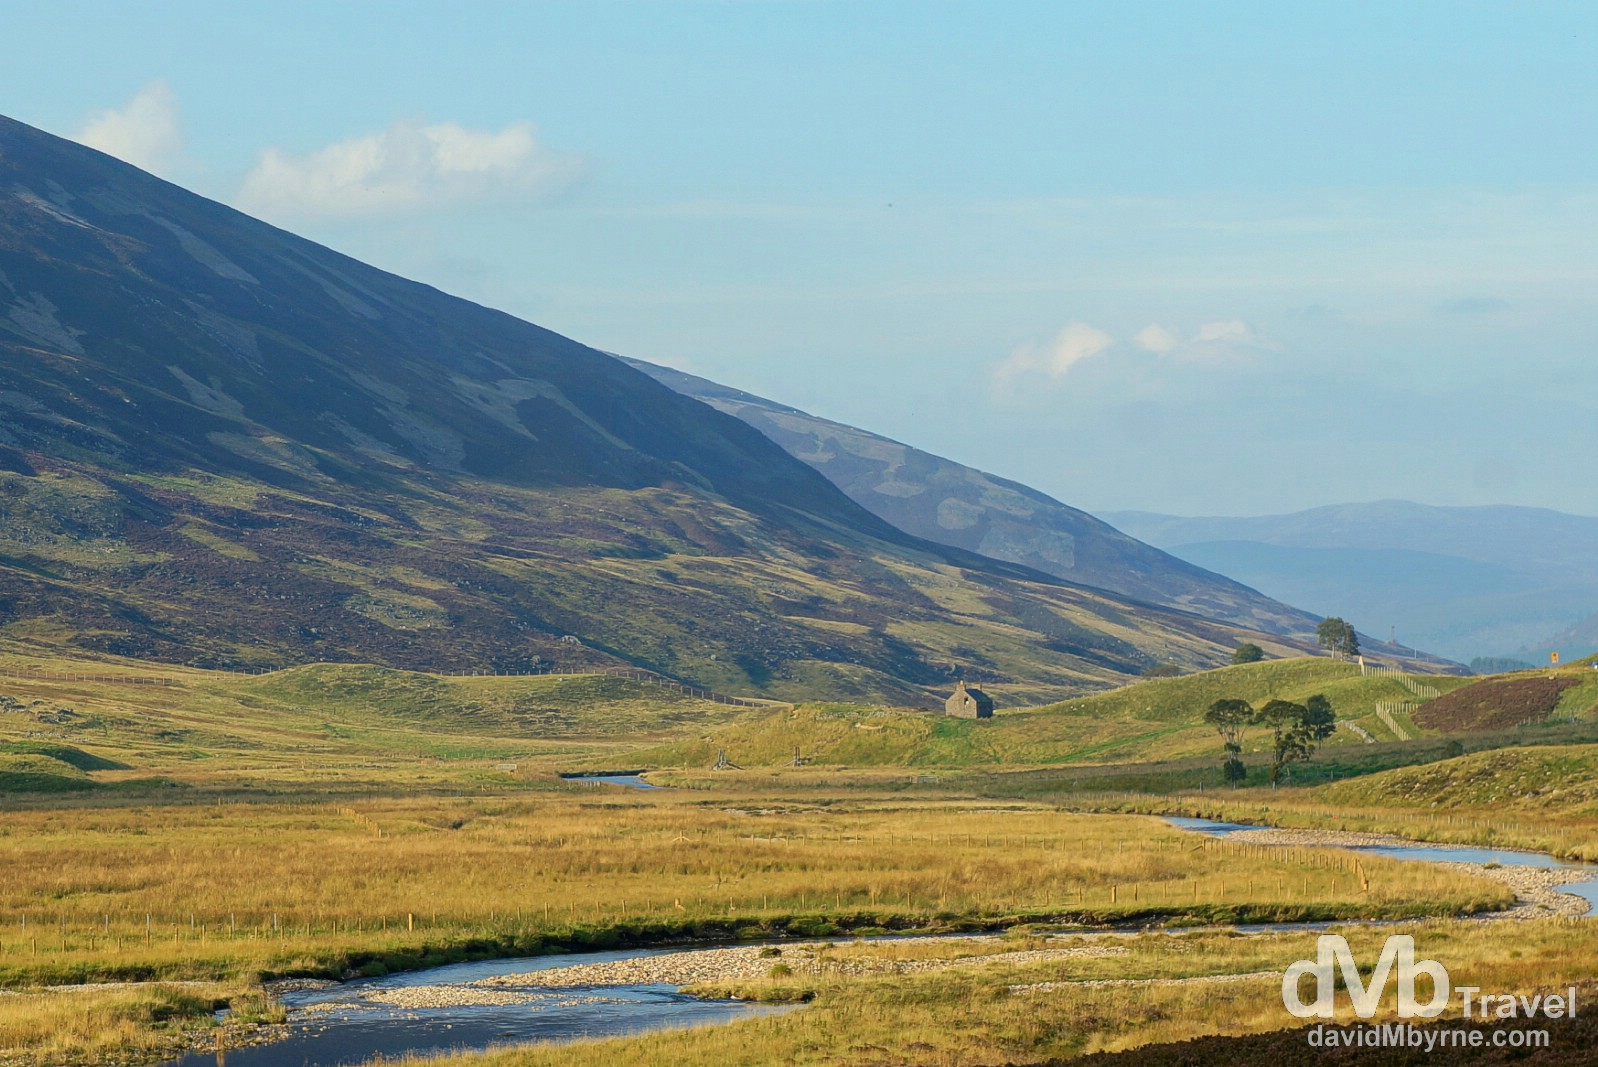 Scenery in Cairngorms National Park, Scotland. September 13, 2014.